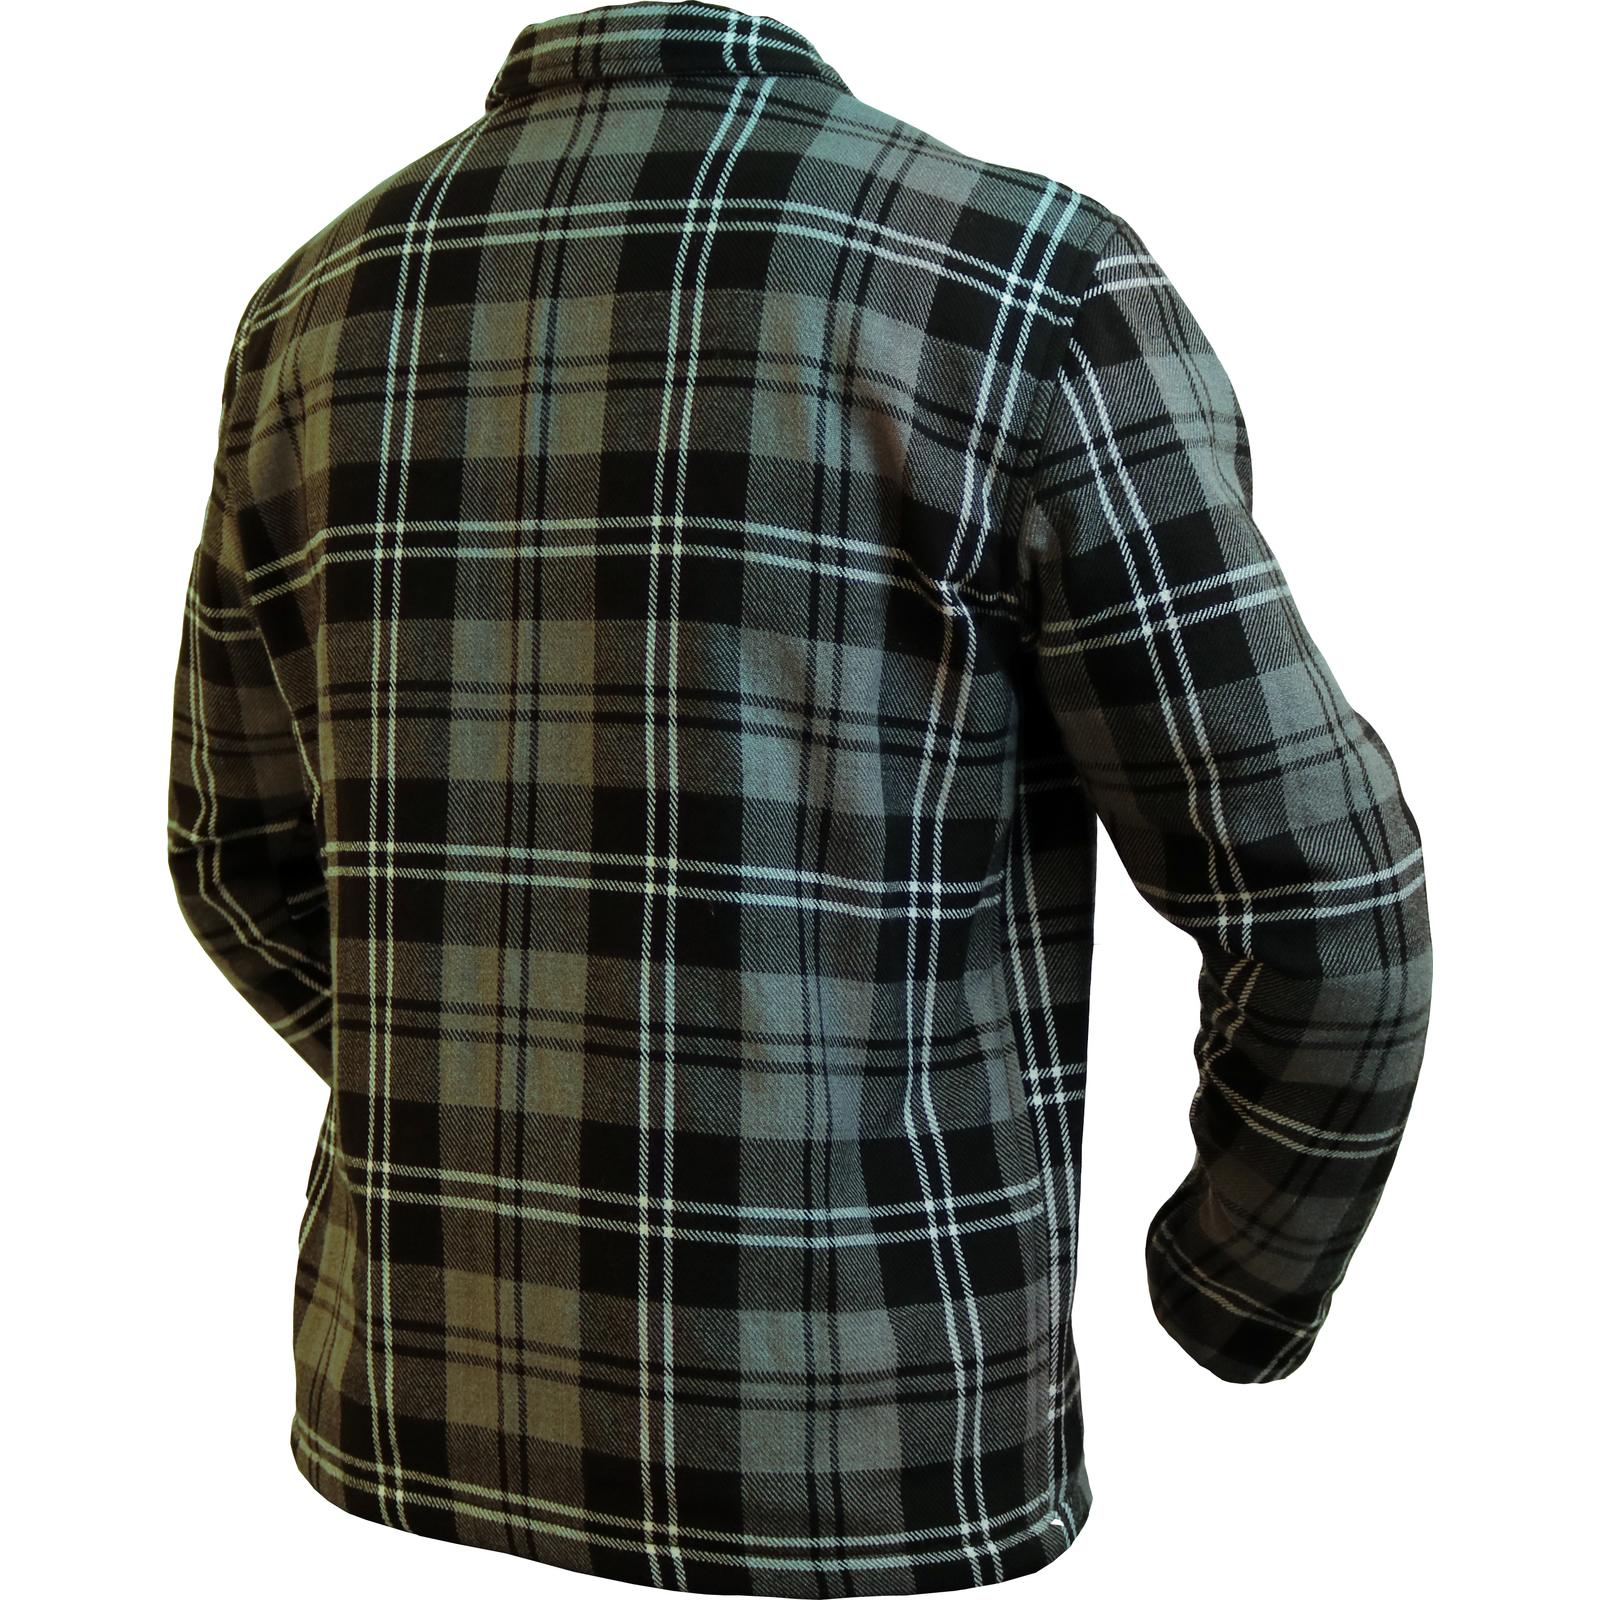 Flannel Motorcycle Jacket >> Armr Moto Aramid Check Motorcycle Shirt Lumberjack Plaid Flannel